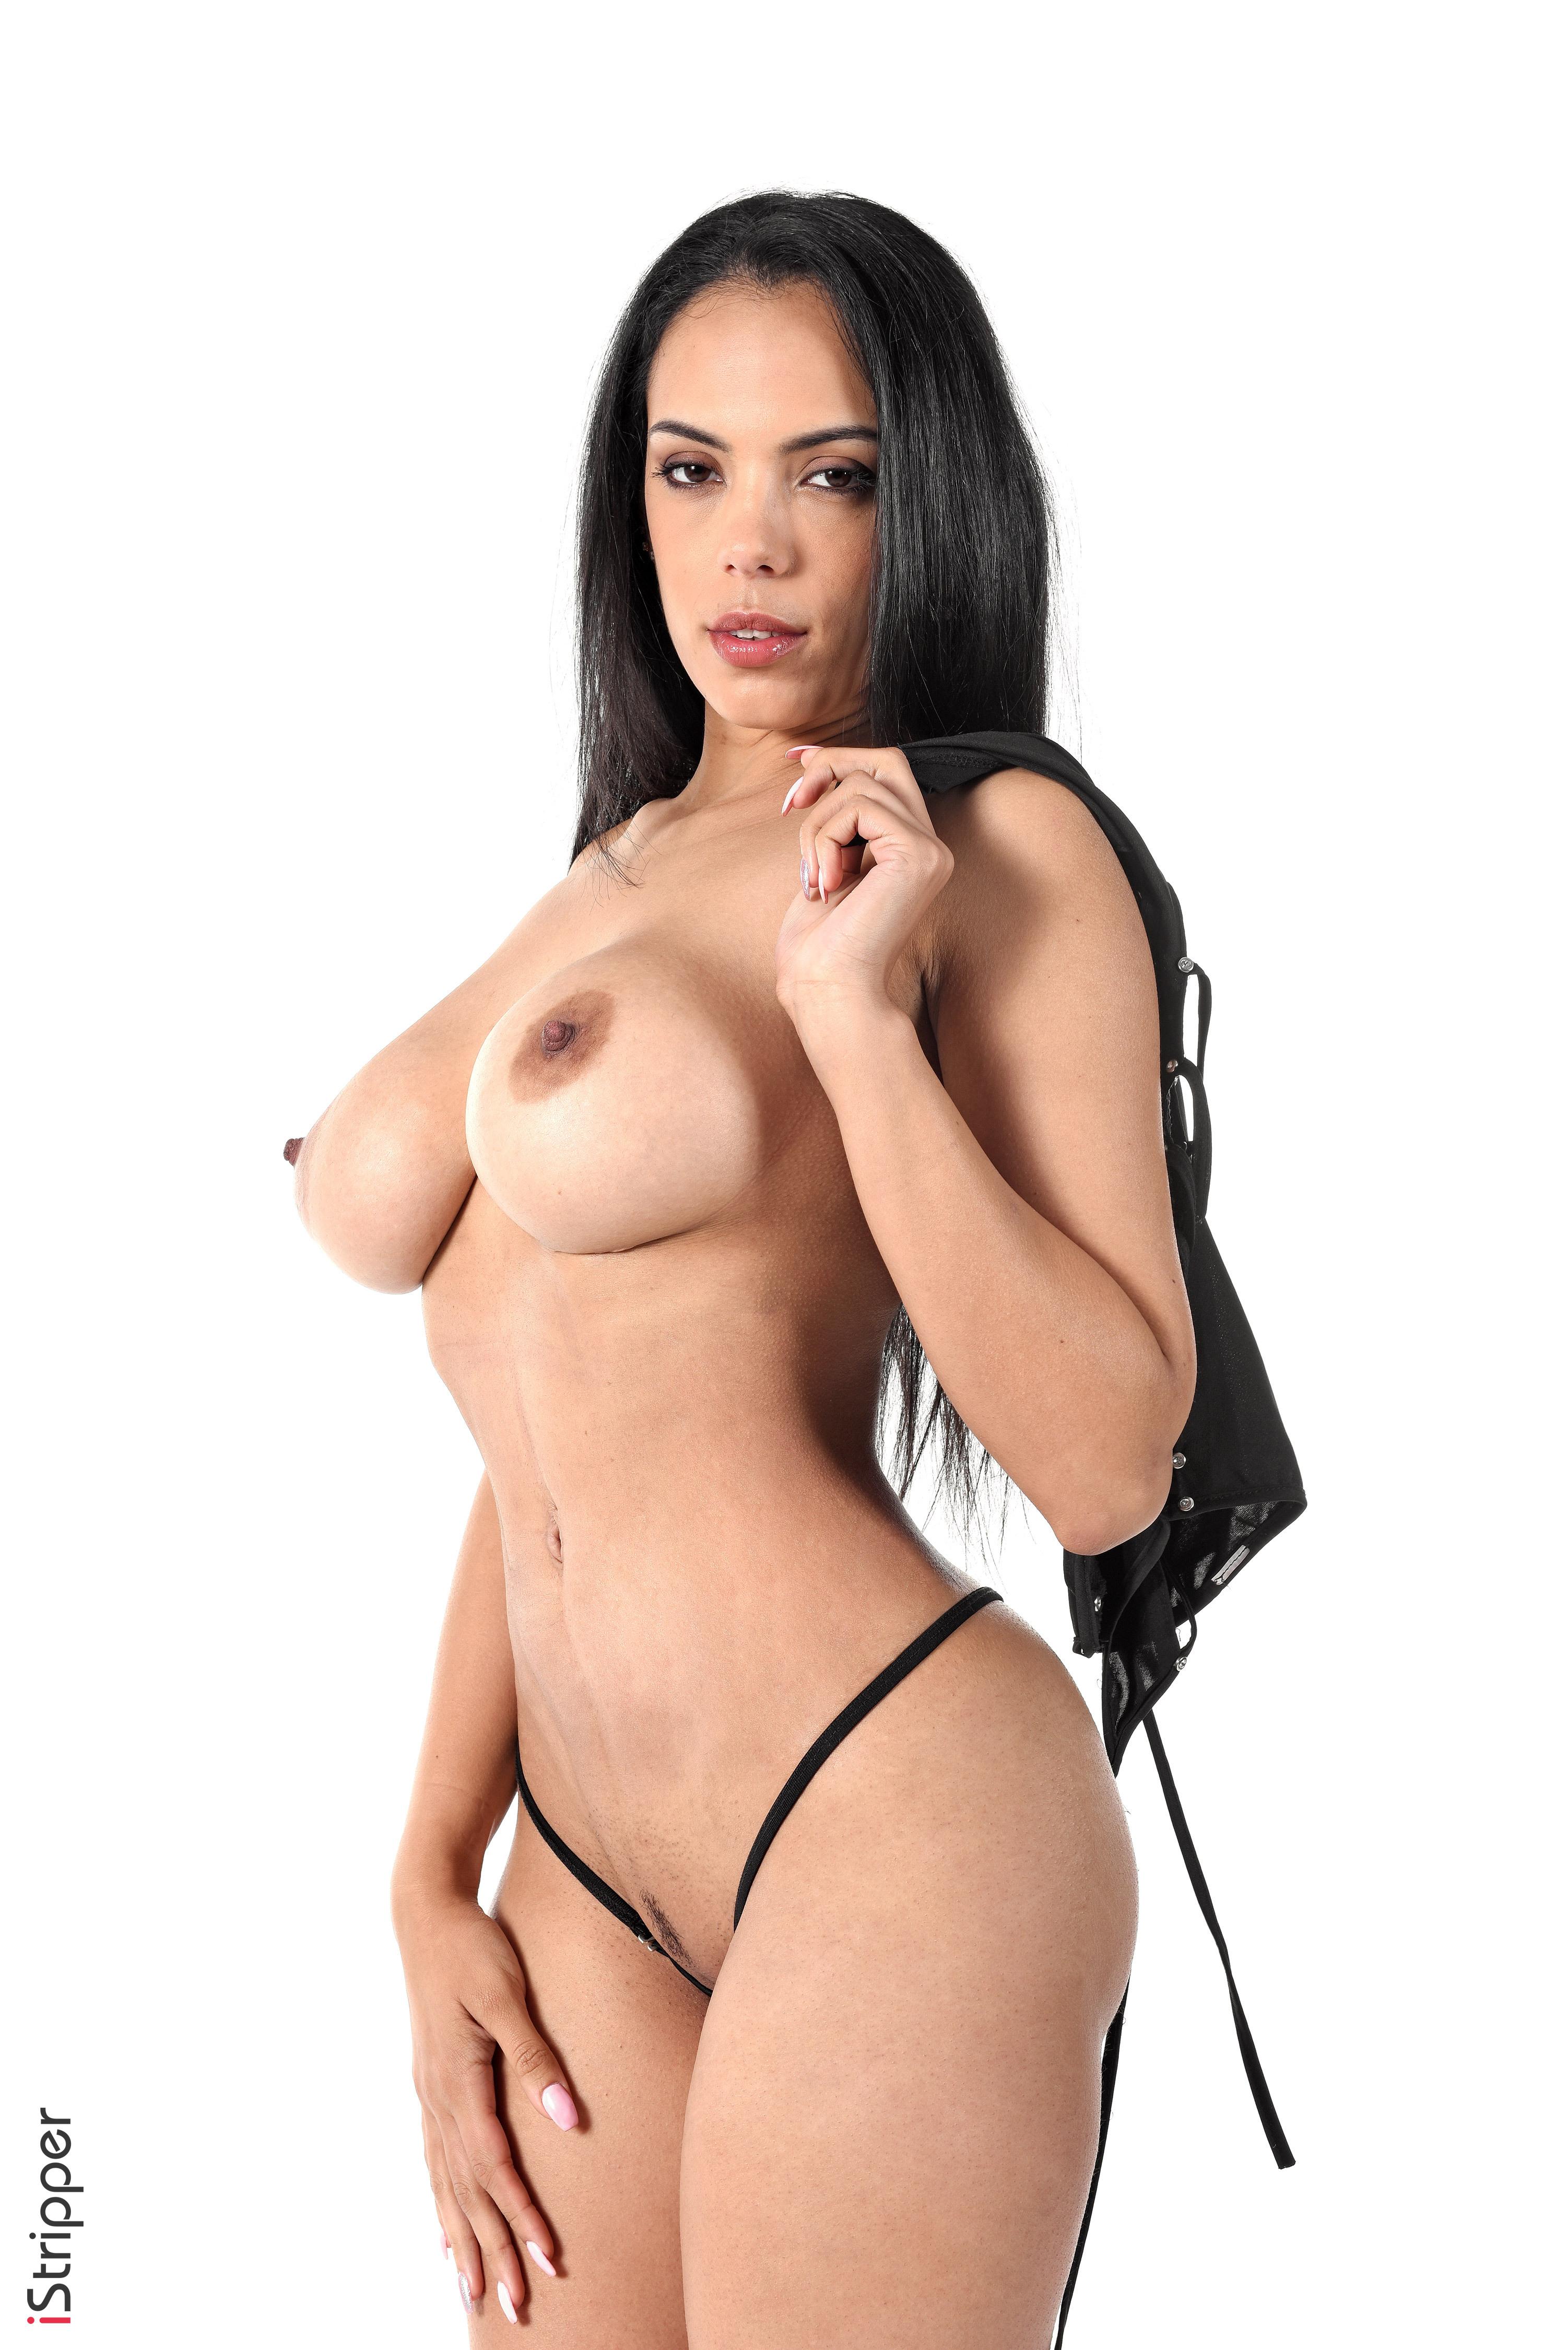 sexy lesbian girls stripping